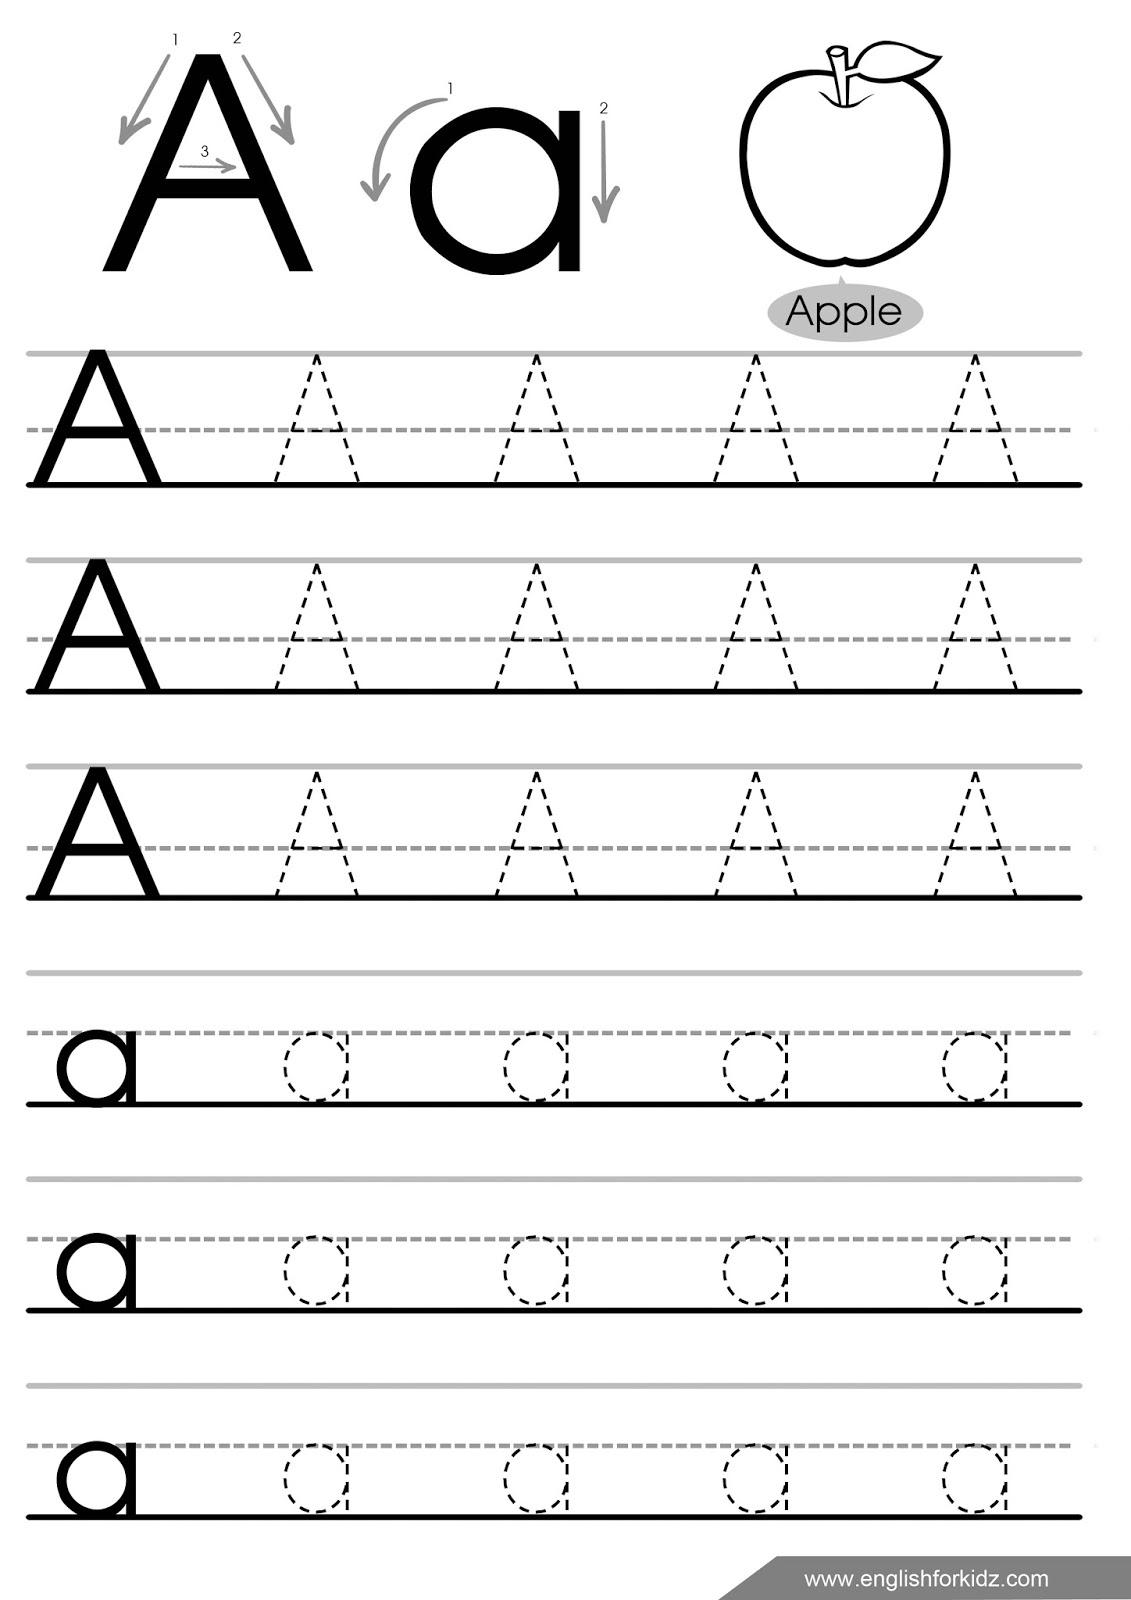 Letter Tracing Worksheets Letters Children Worksheet Math within Letter Tracing Homework